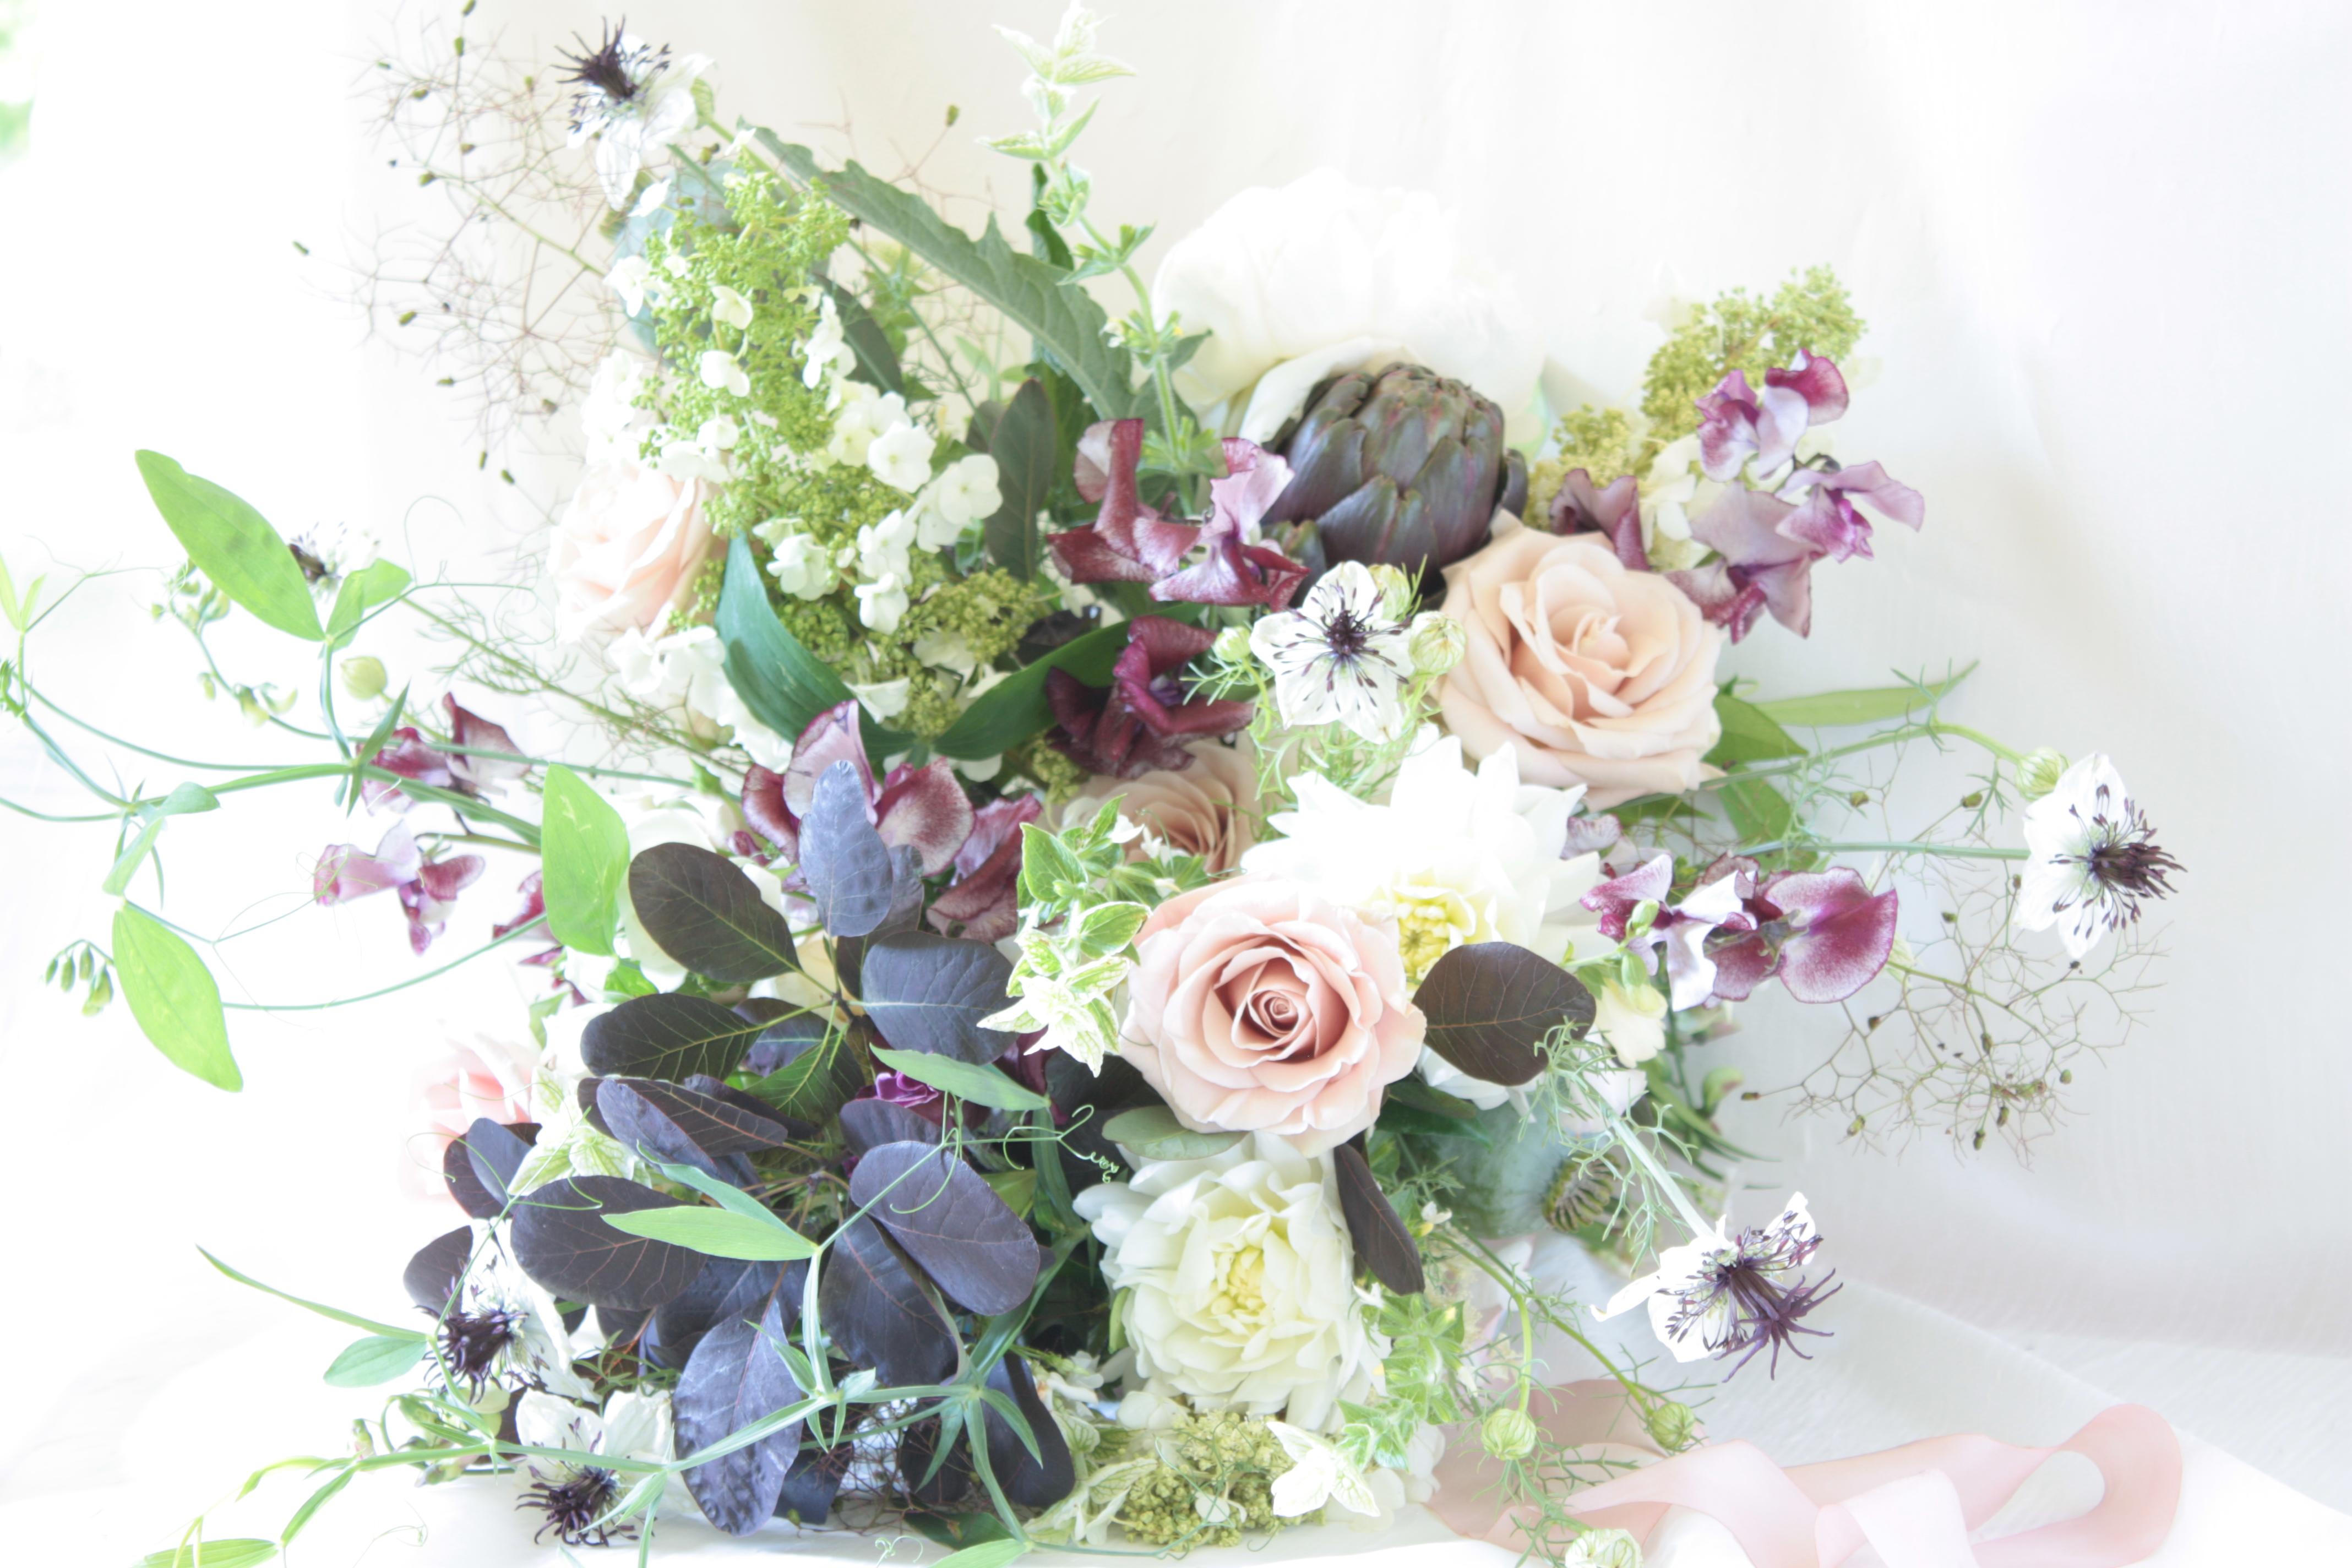 bridal bouquet wedding flowers wedding bouquet bride seattle bride seattle weddings seattle wedding florist seattle wedding flowers seattle floral design